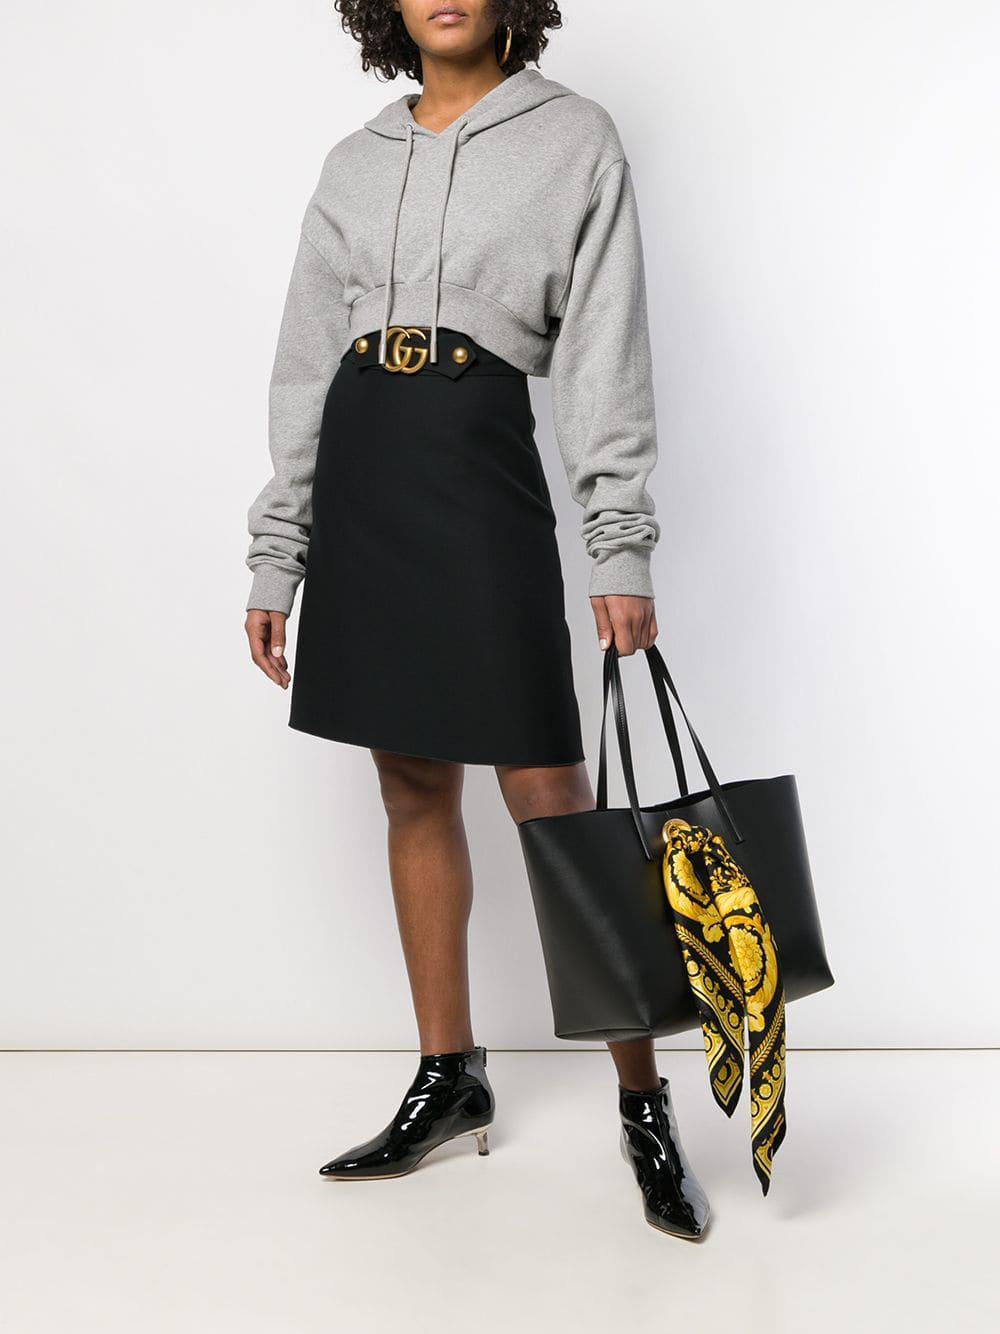 Versace Baroque Scarf Tote Bag in Black - Save 16.094584286803965 ... aa434718783c0